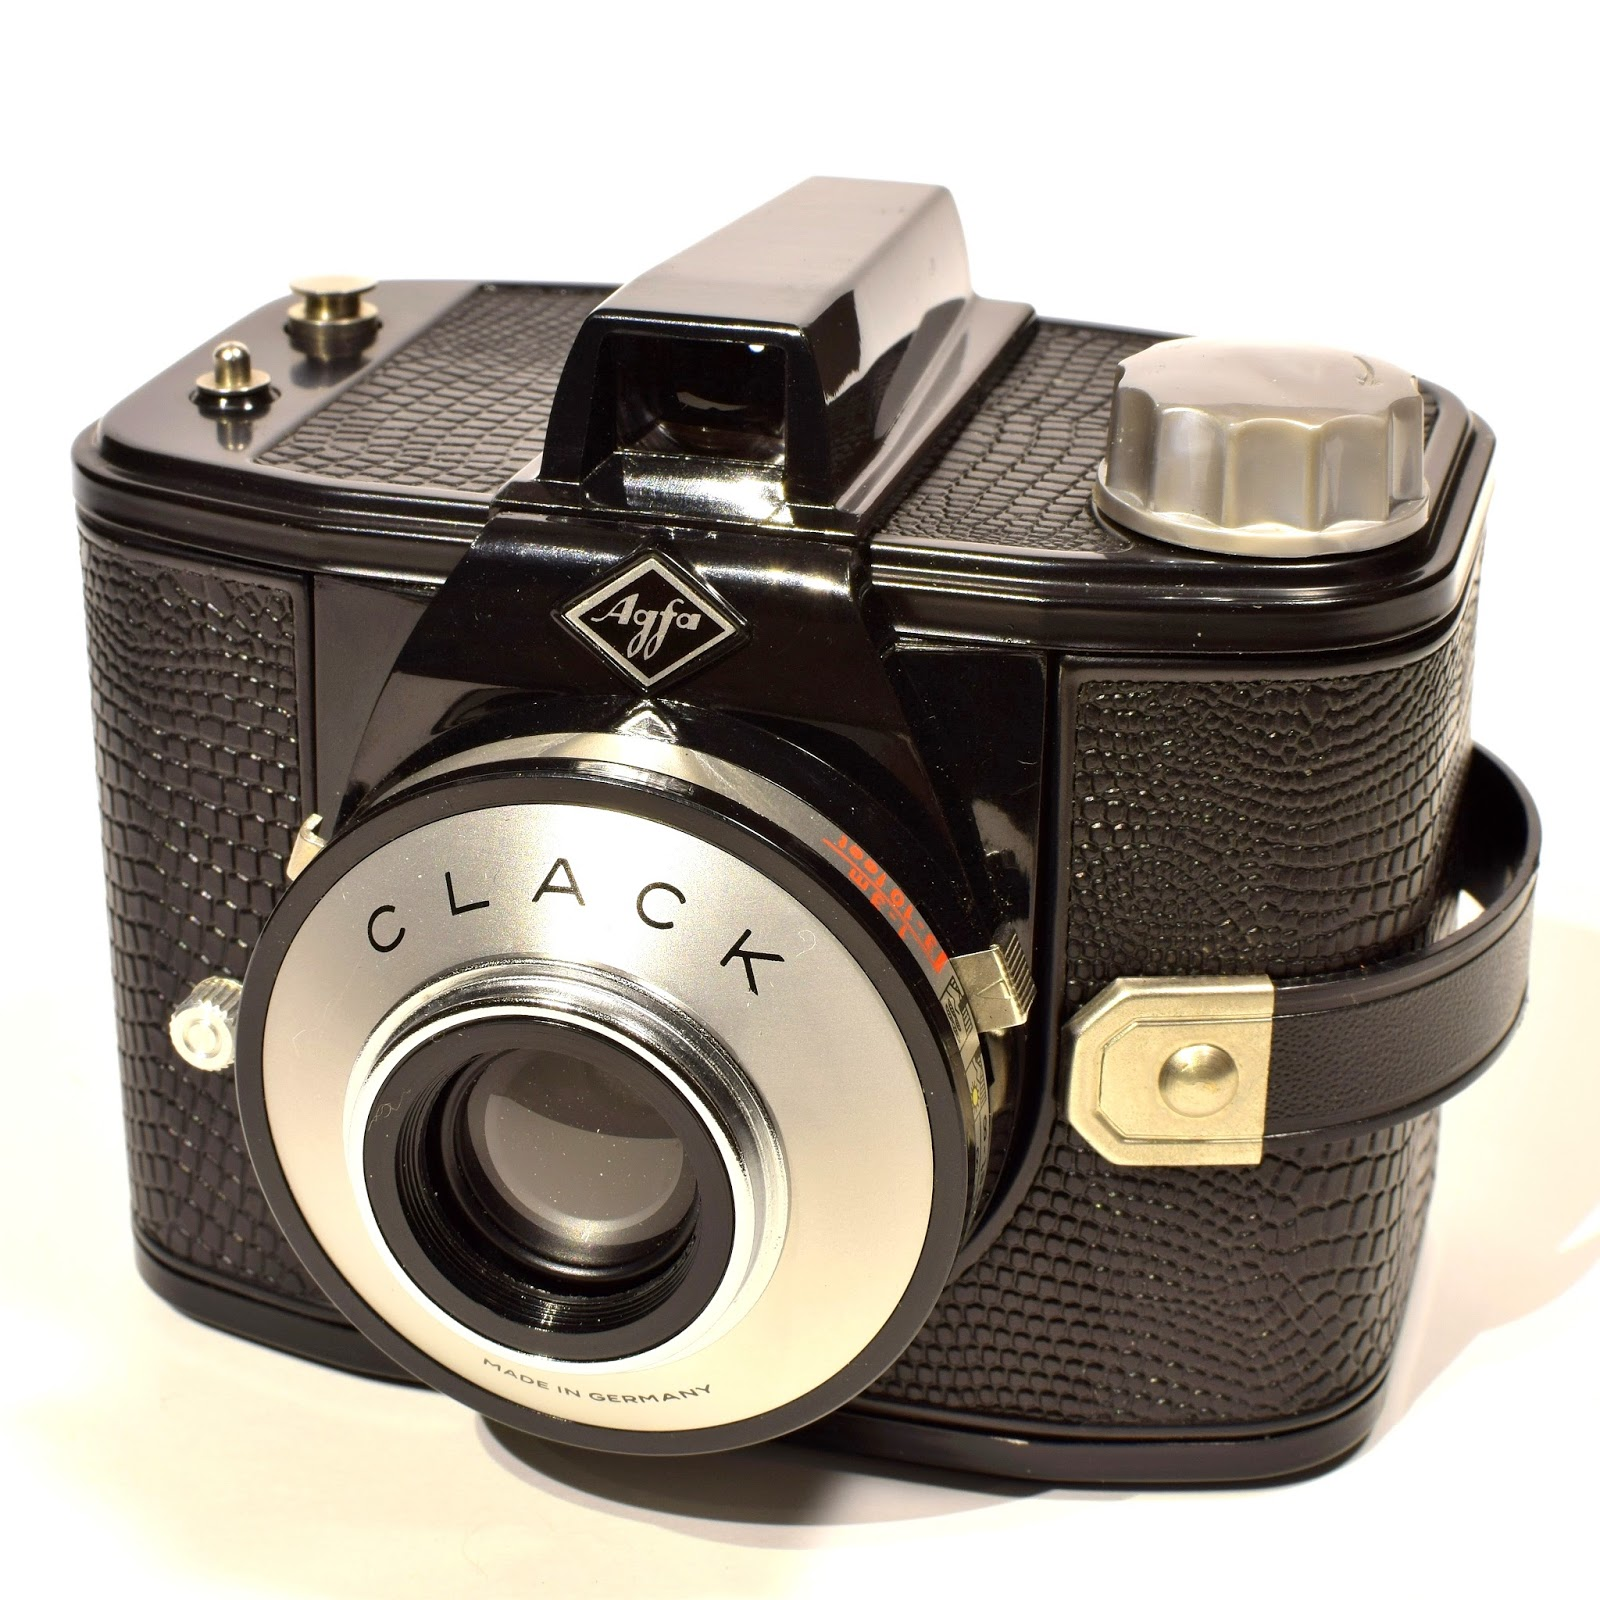 agfa clack 1954 vintage cameras collection rh vintagecamerascollection blogspot com